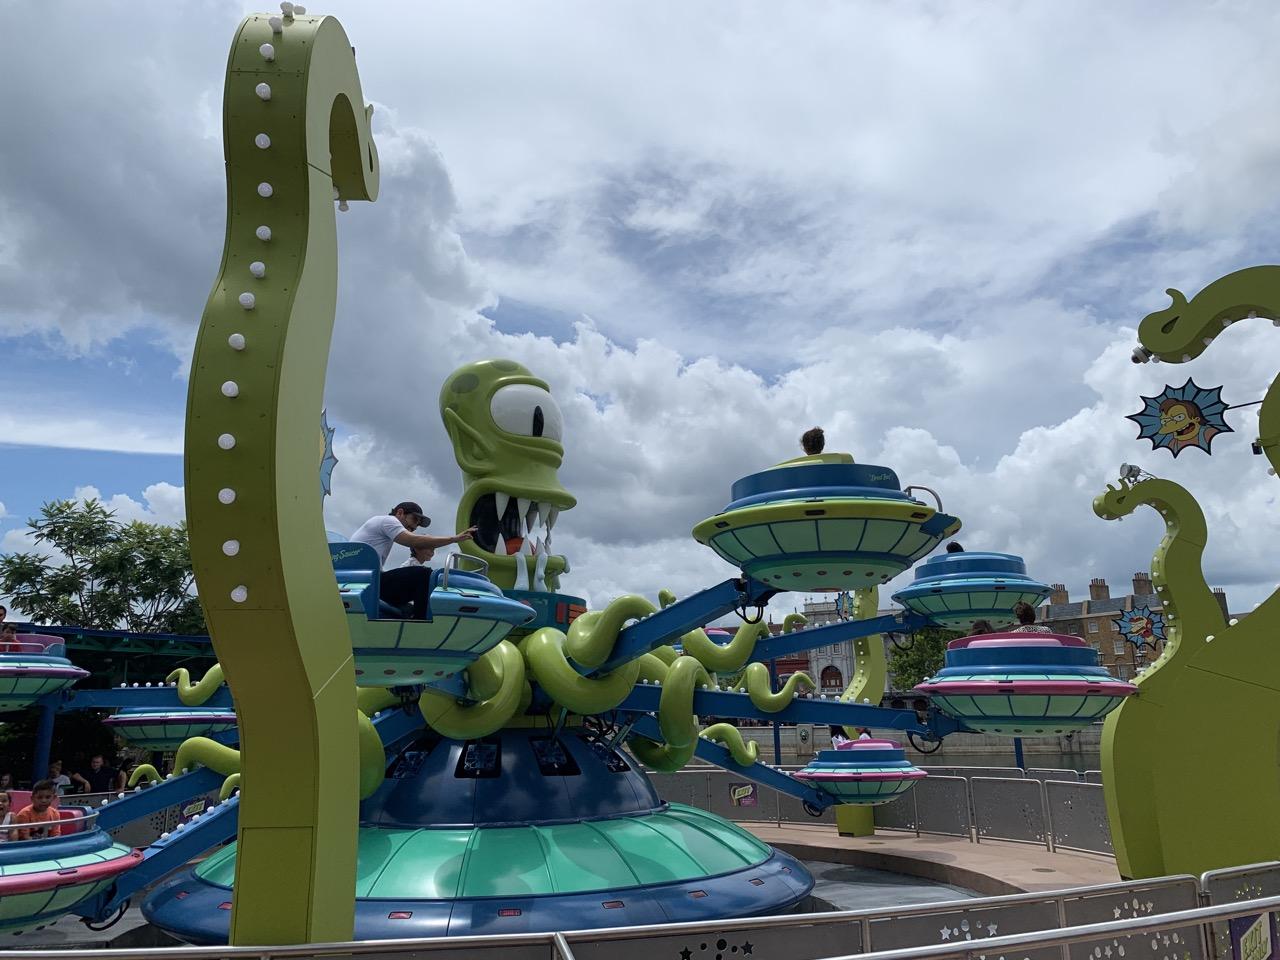 universal studios florida rides guide best rides twirl n hurl.jpeg